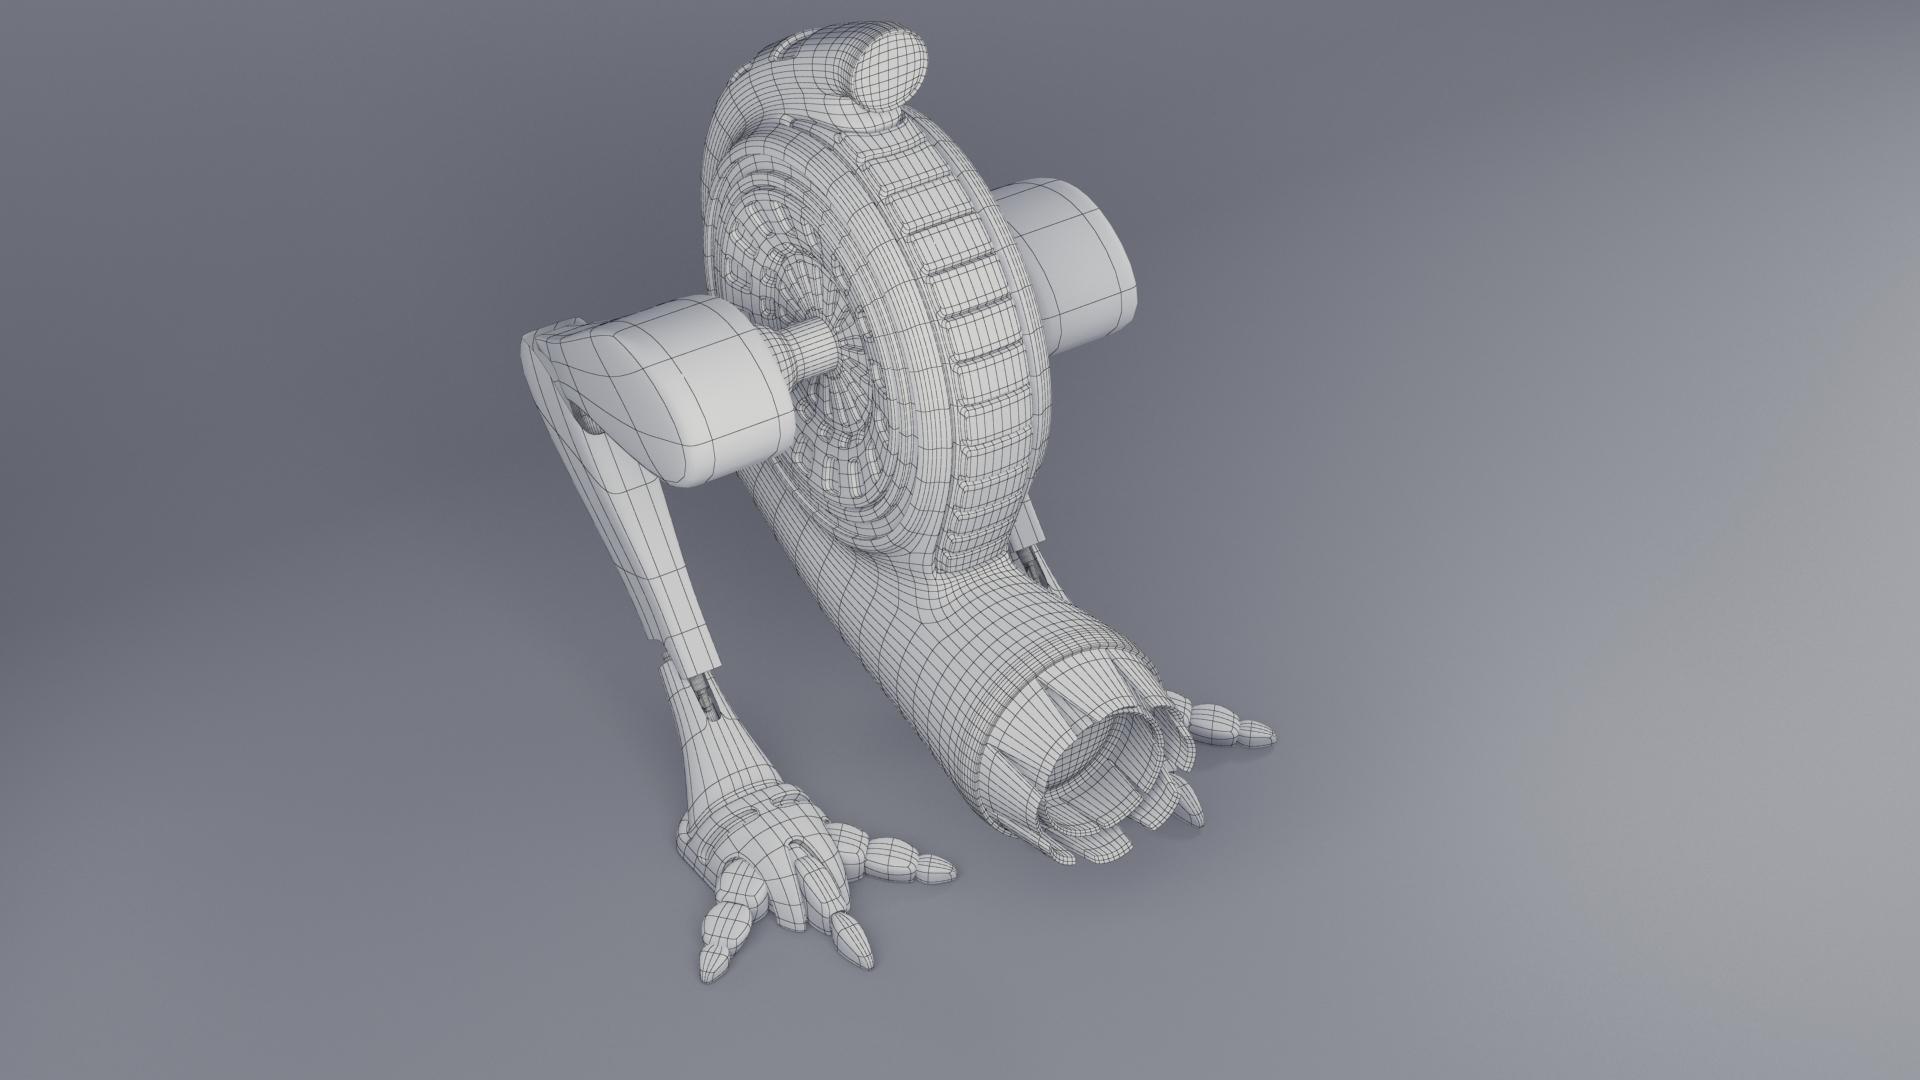 Three D Guns 2 Challenge | SciFi Gun